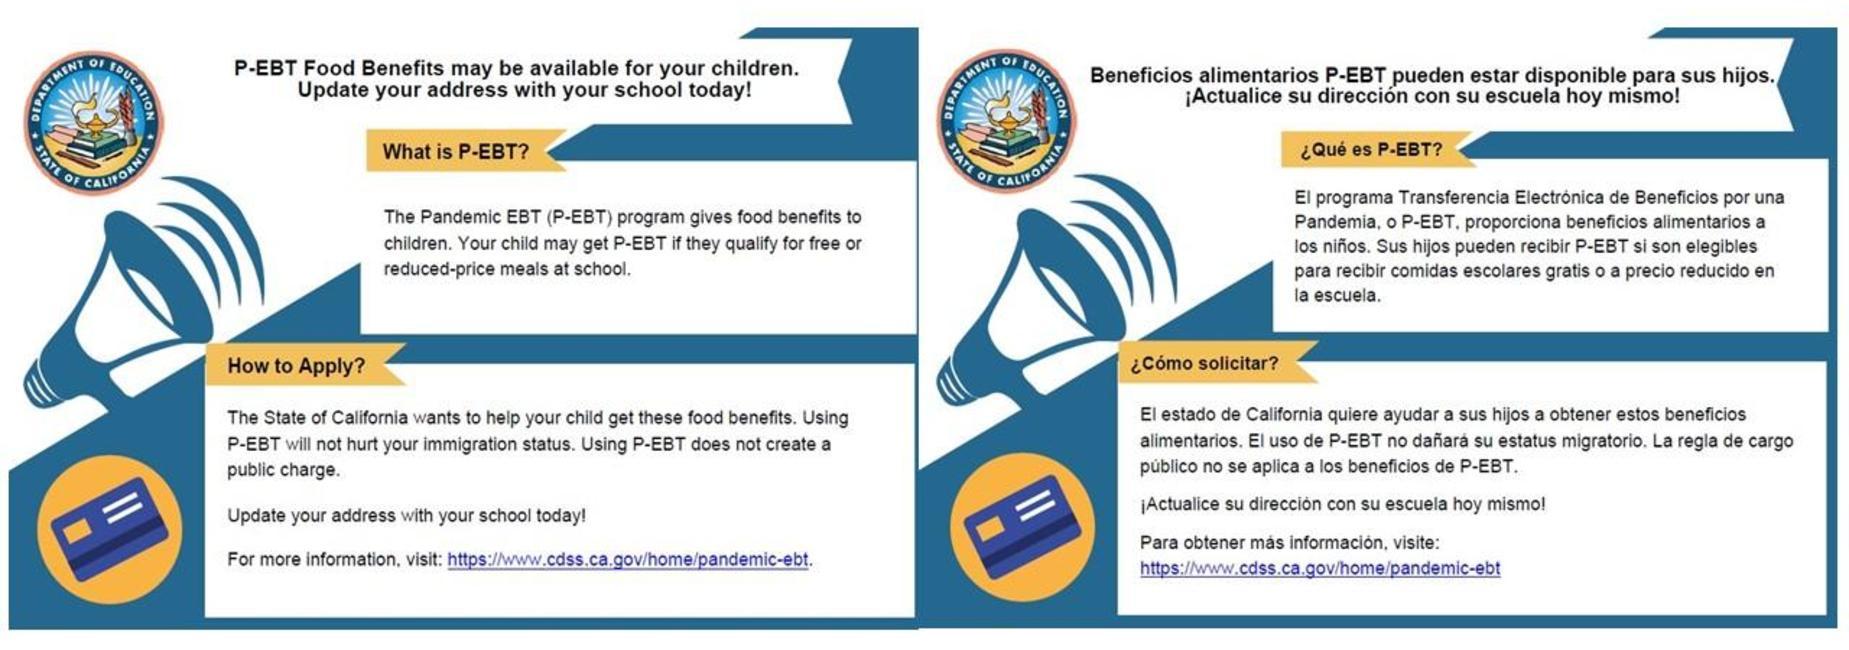 P-EBT Food Benefits